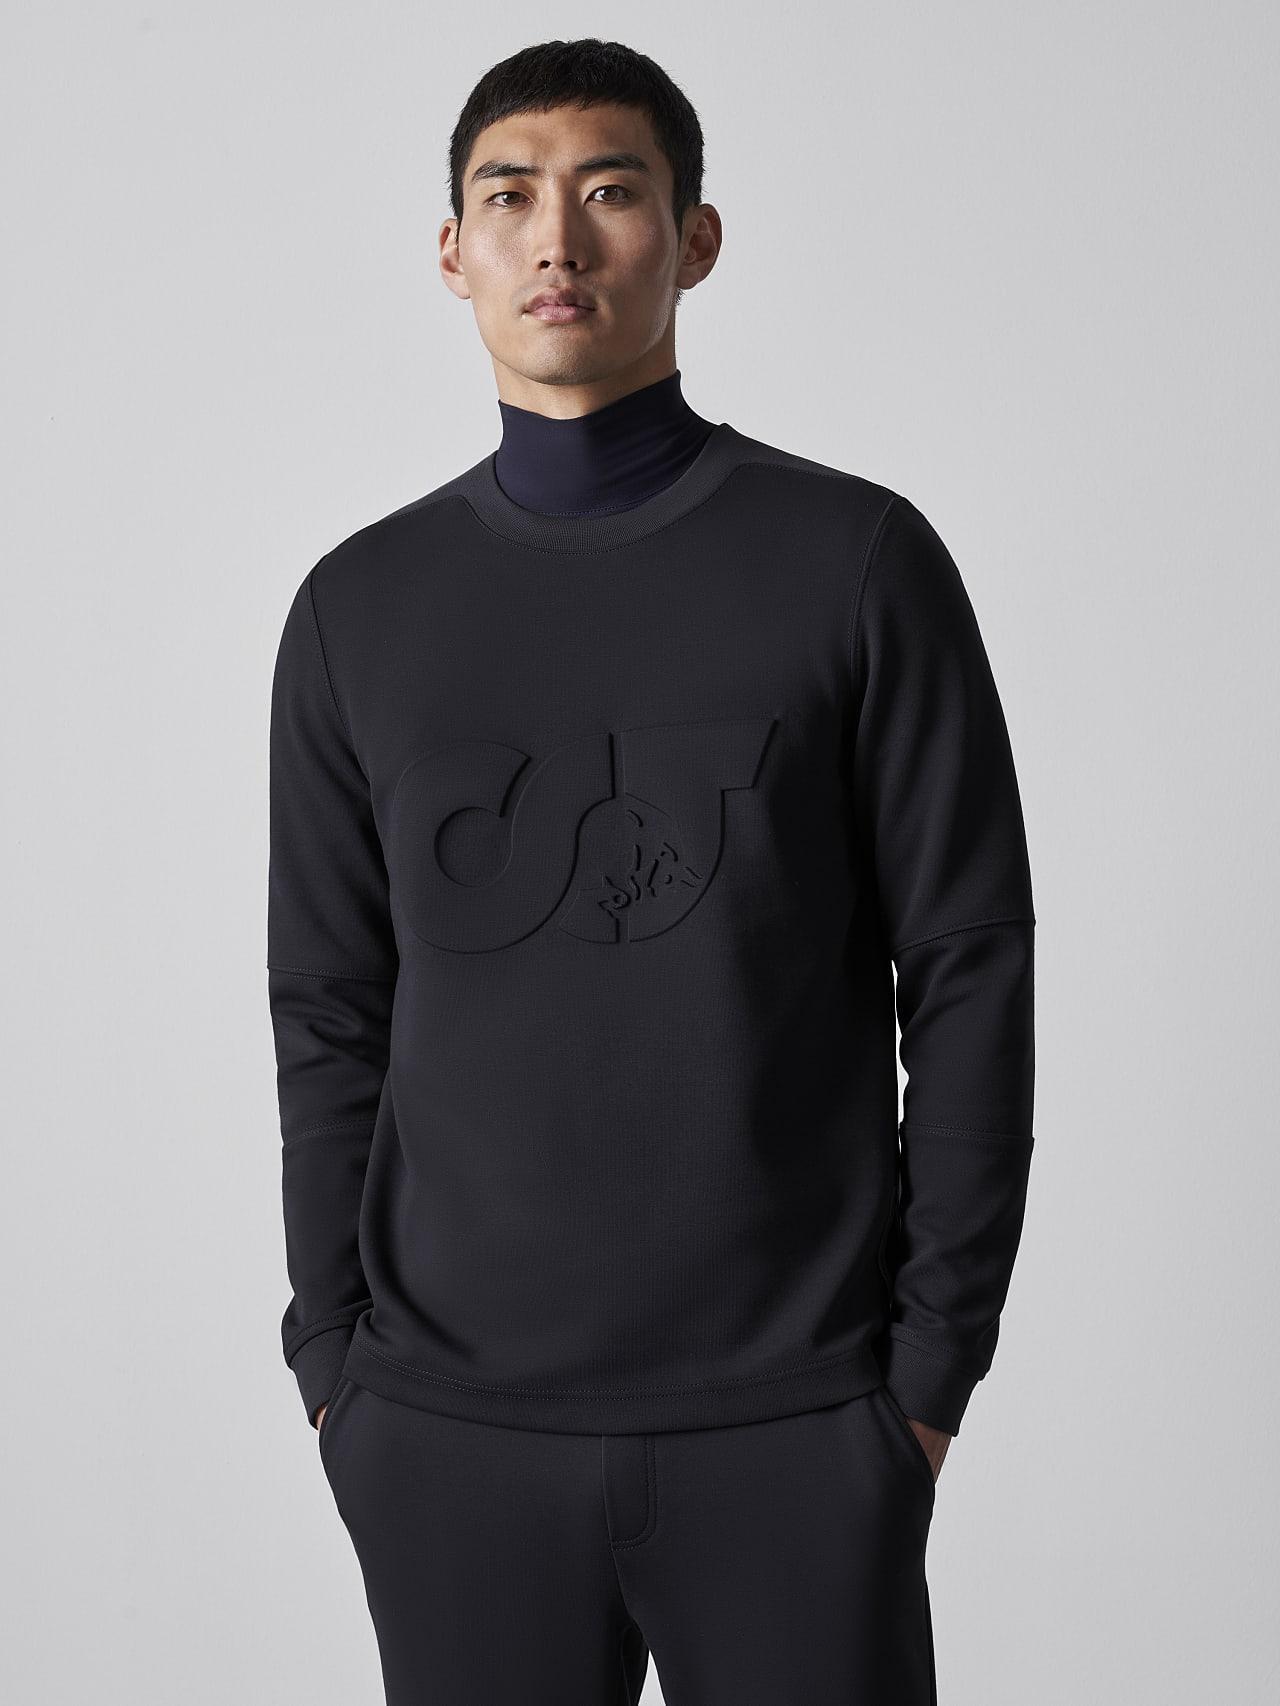 SCONA V1.Y5.02 Premium Sweatshirt black Model shot Alpha Tauri